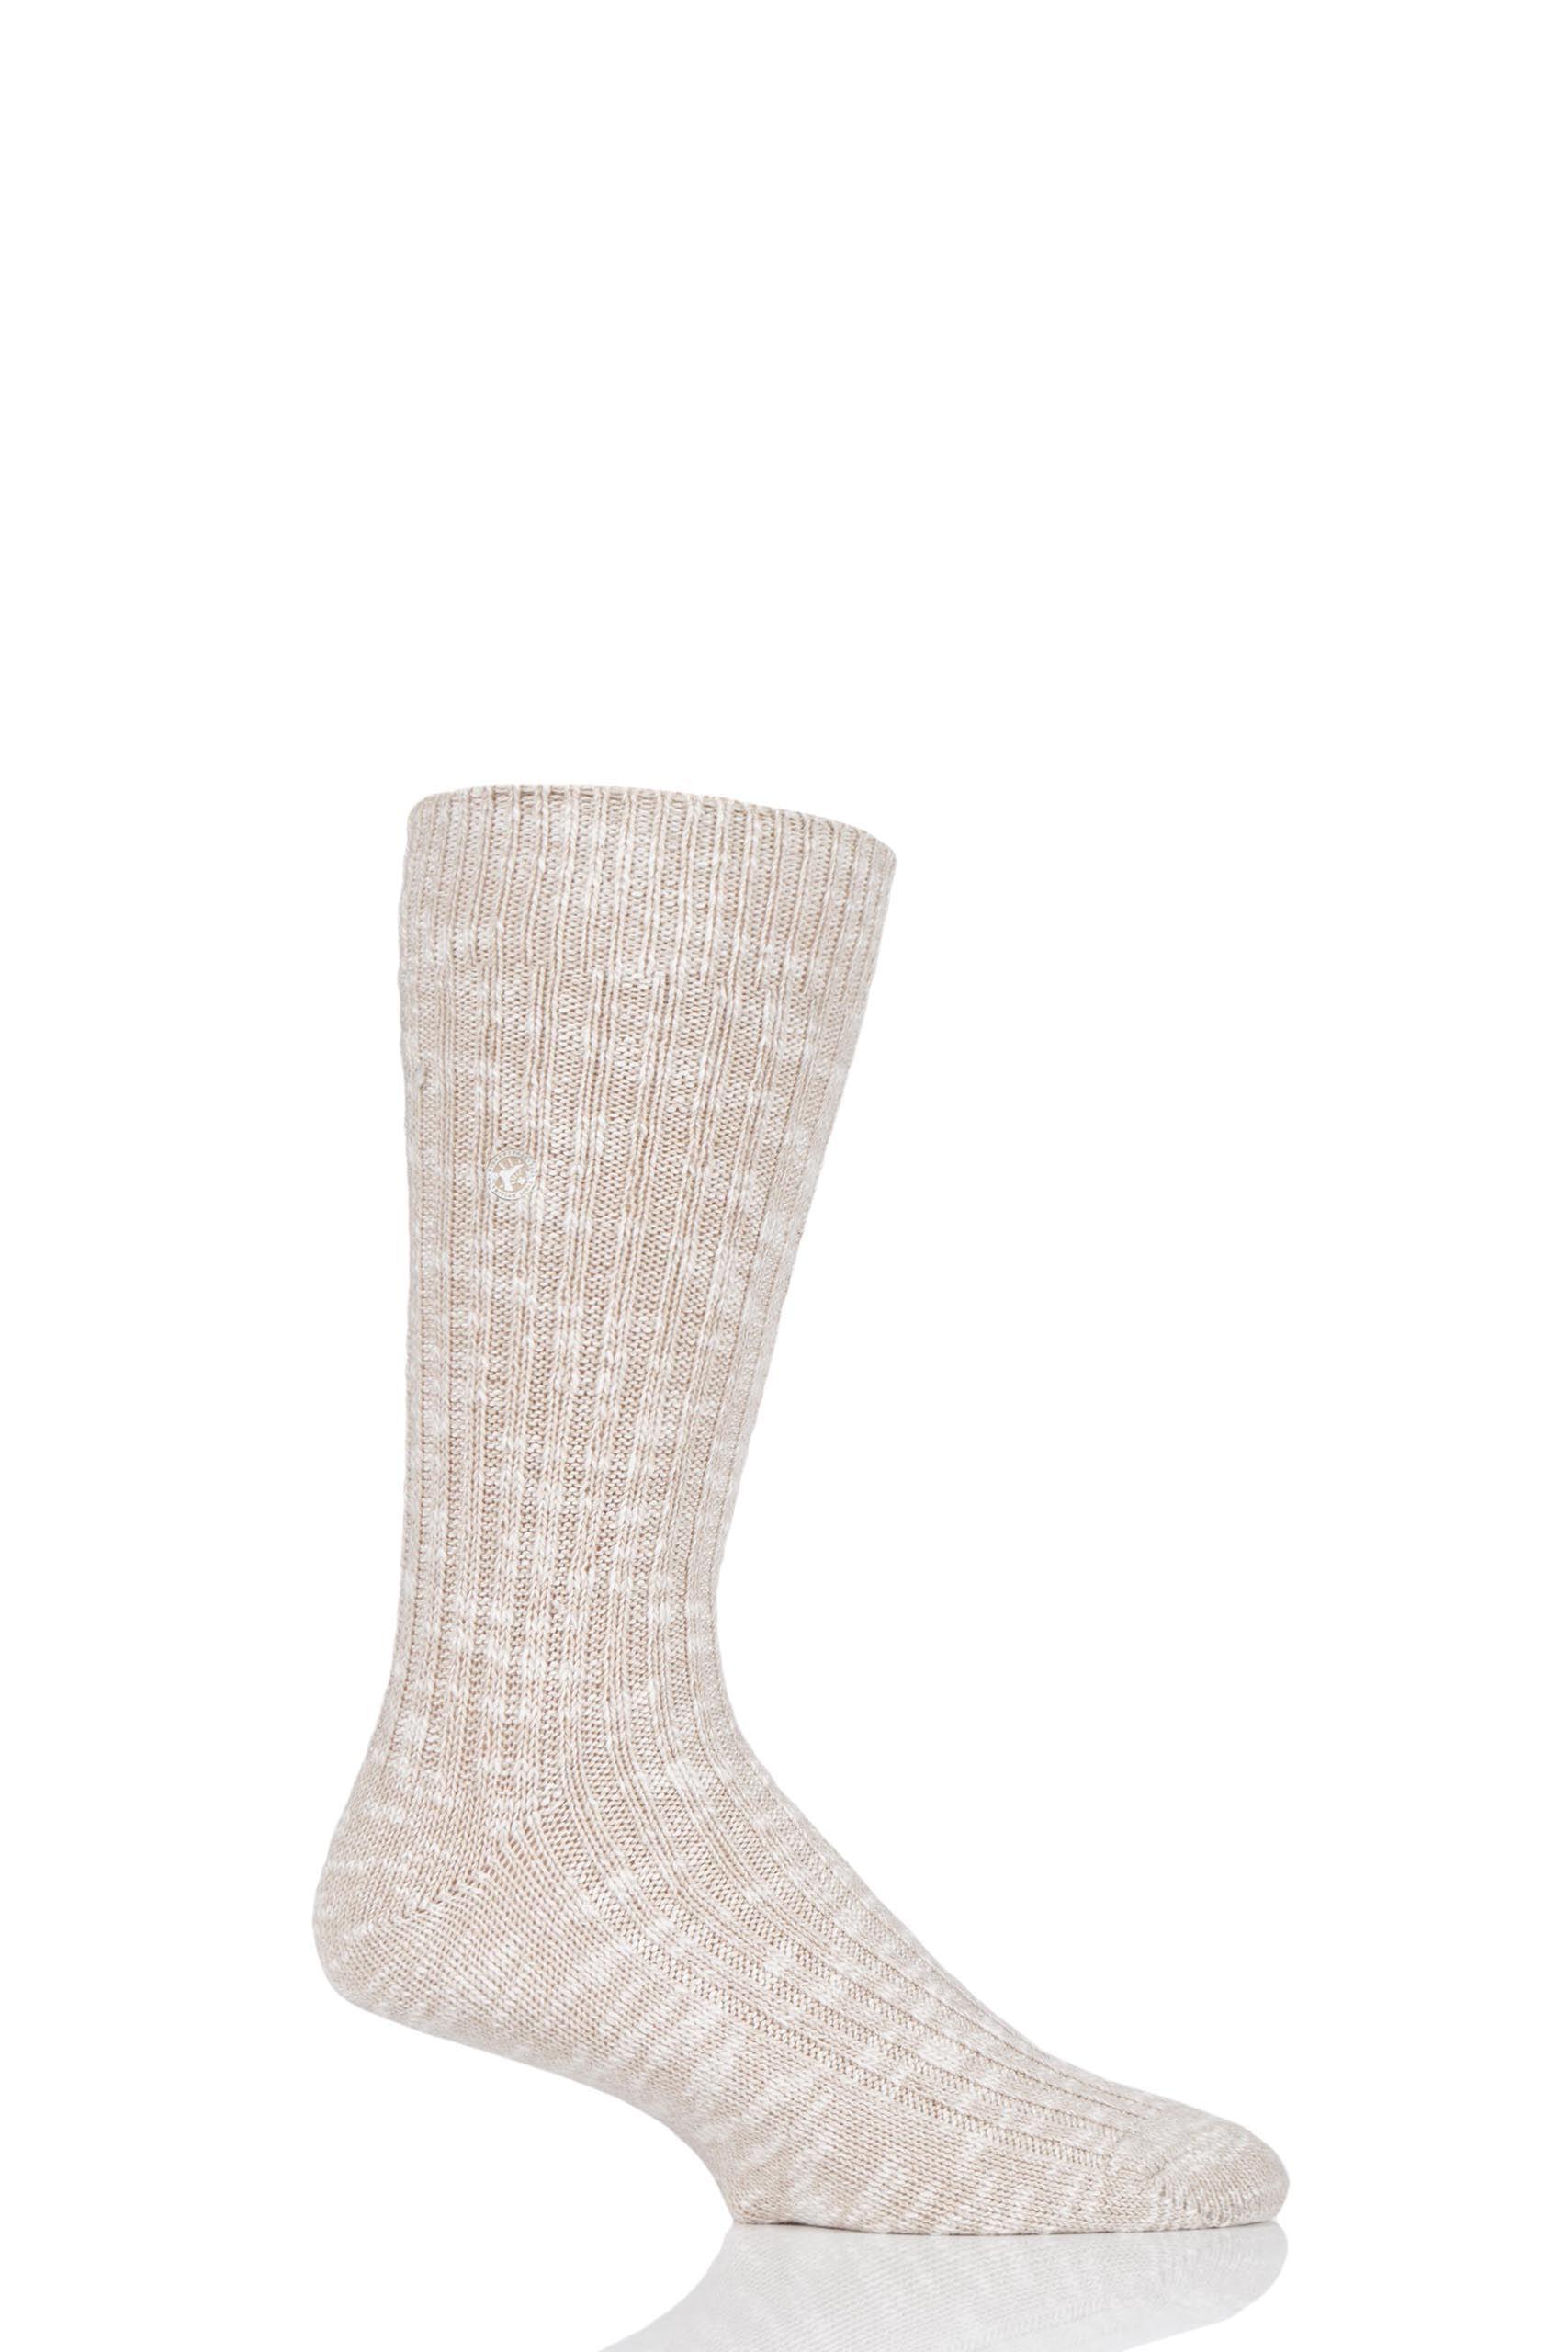 Image of 1 Pair Beige Cotton Slub Thick Ribbed Socks Men's 8-9.5 Mens - Birkenstock